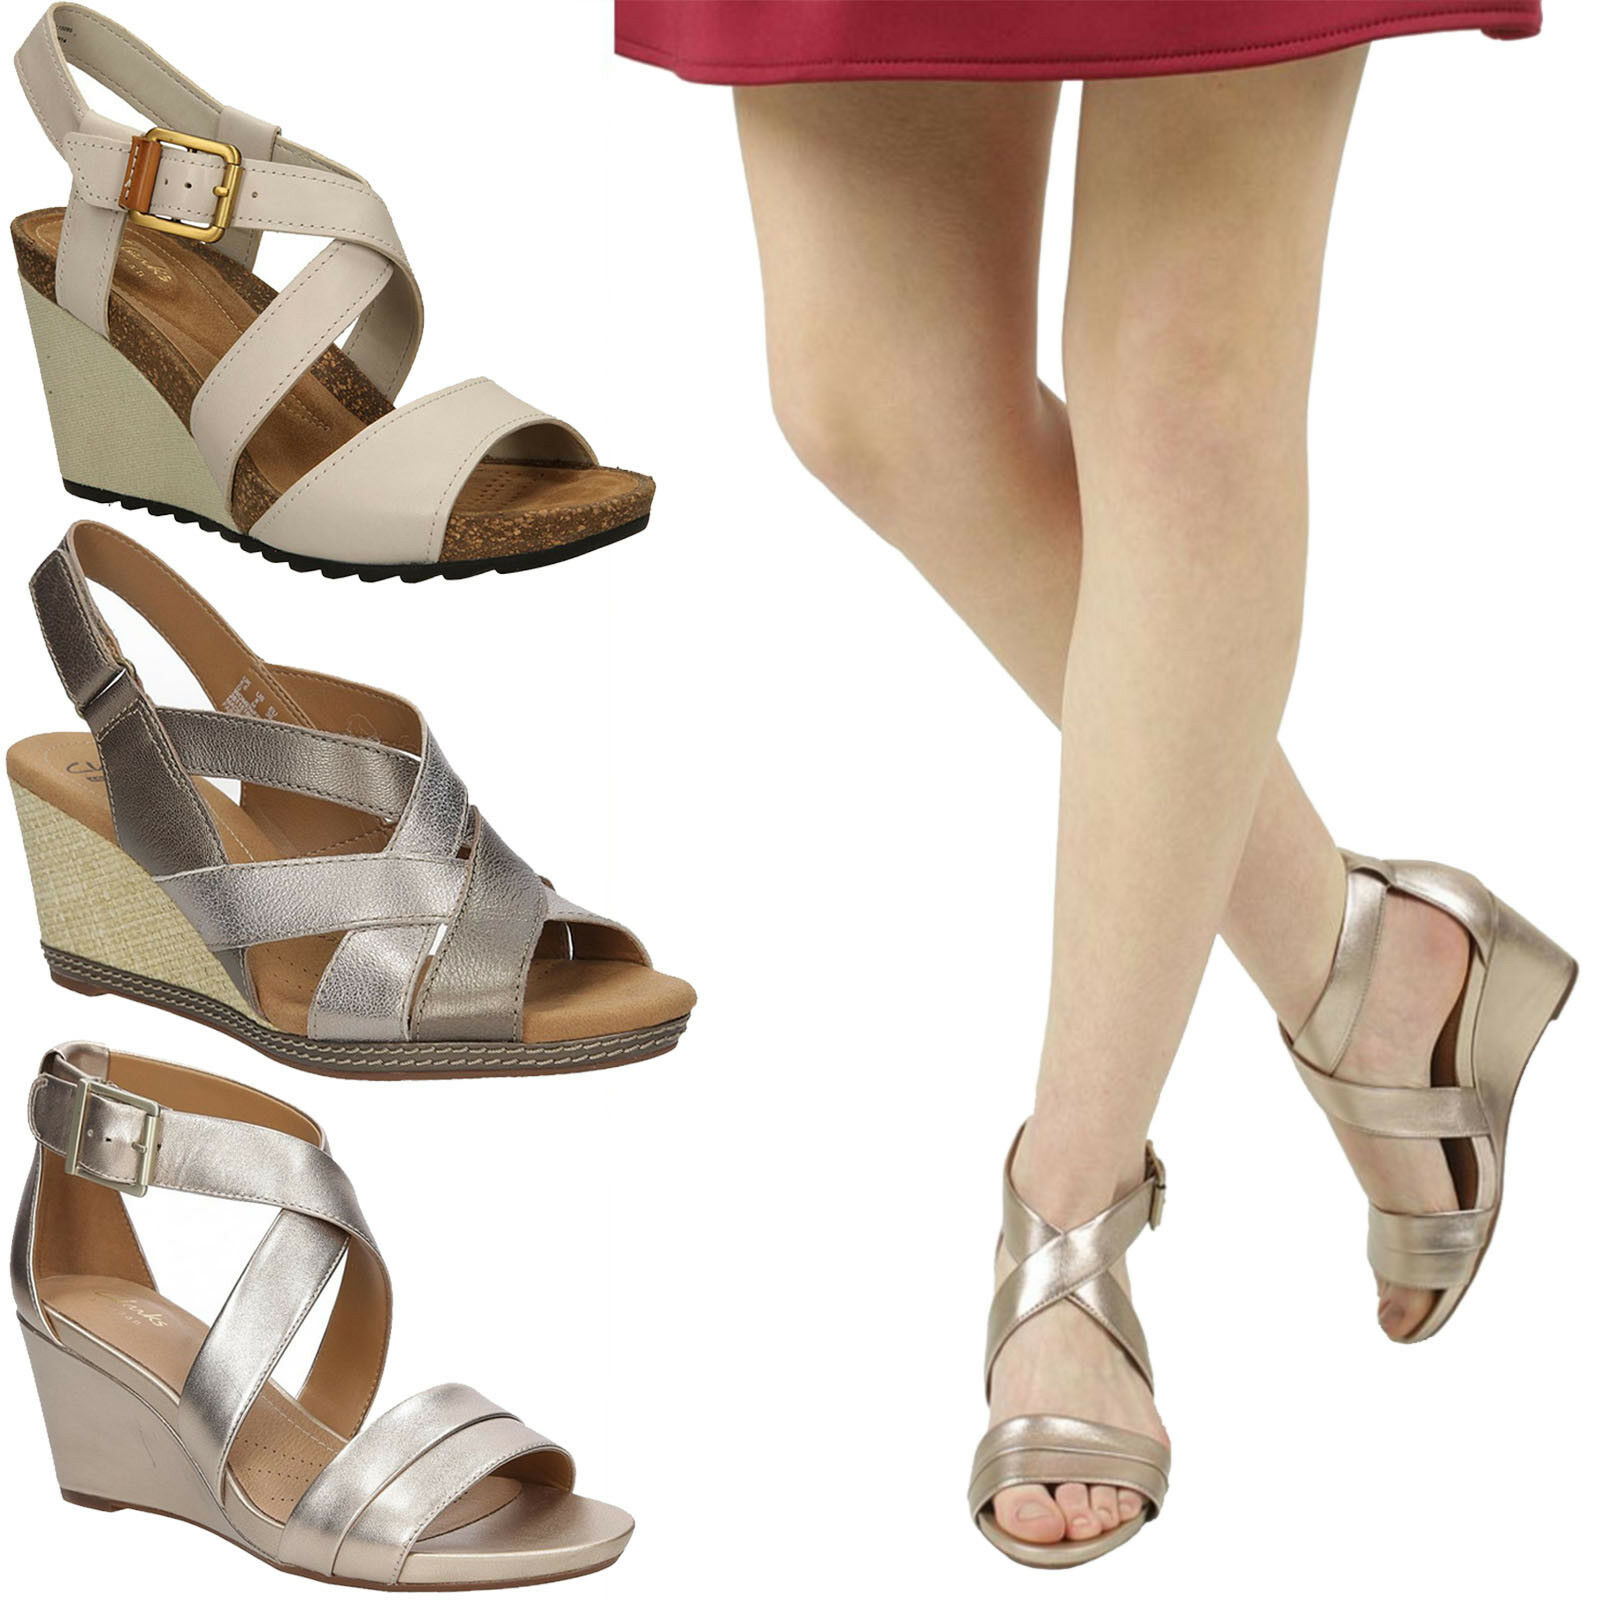 Satén Mujer Azul Am865 Strass Ecb965 Zapatos Haute Sandalias Couture 34cjqRAL5